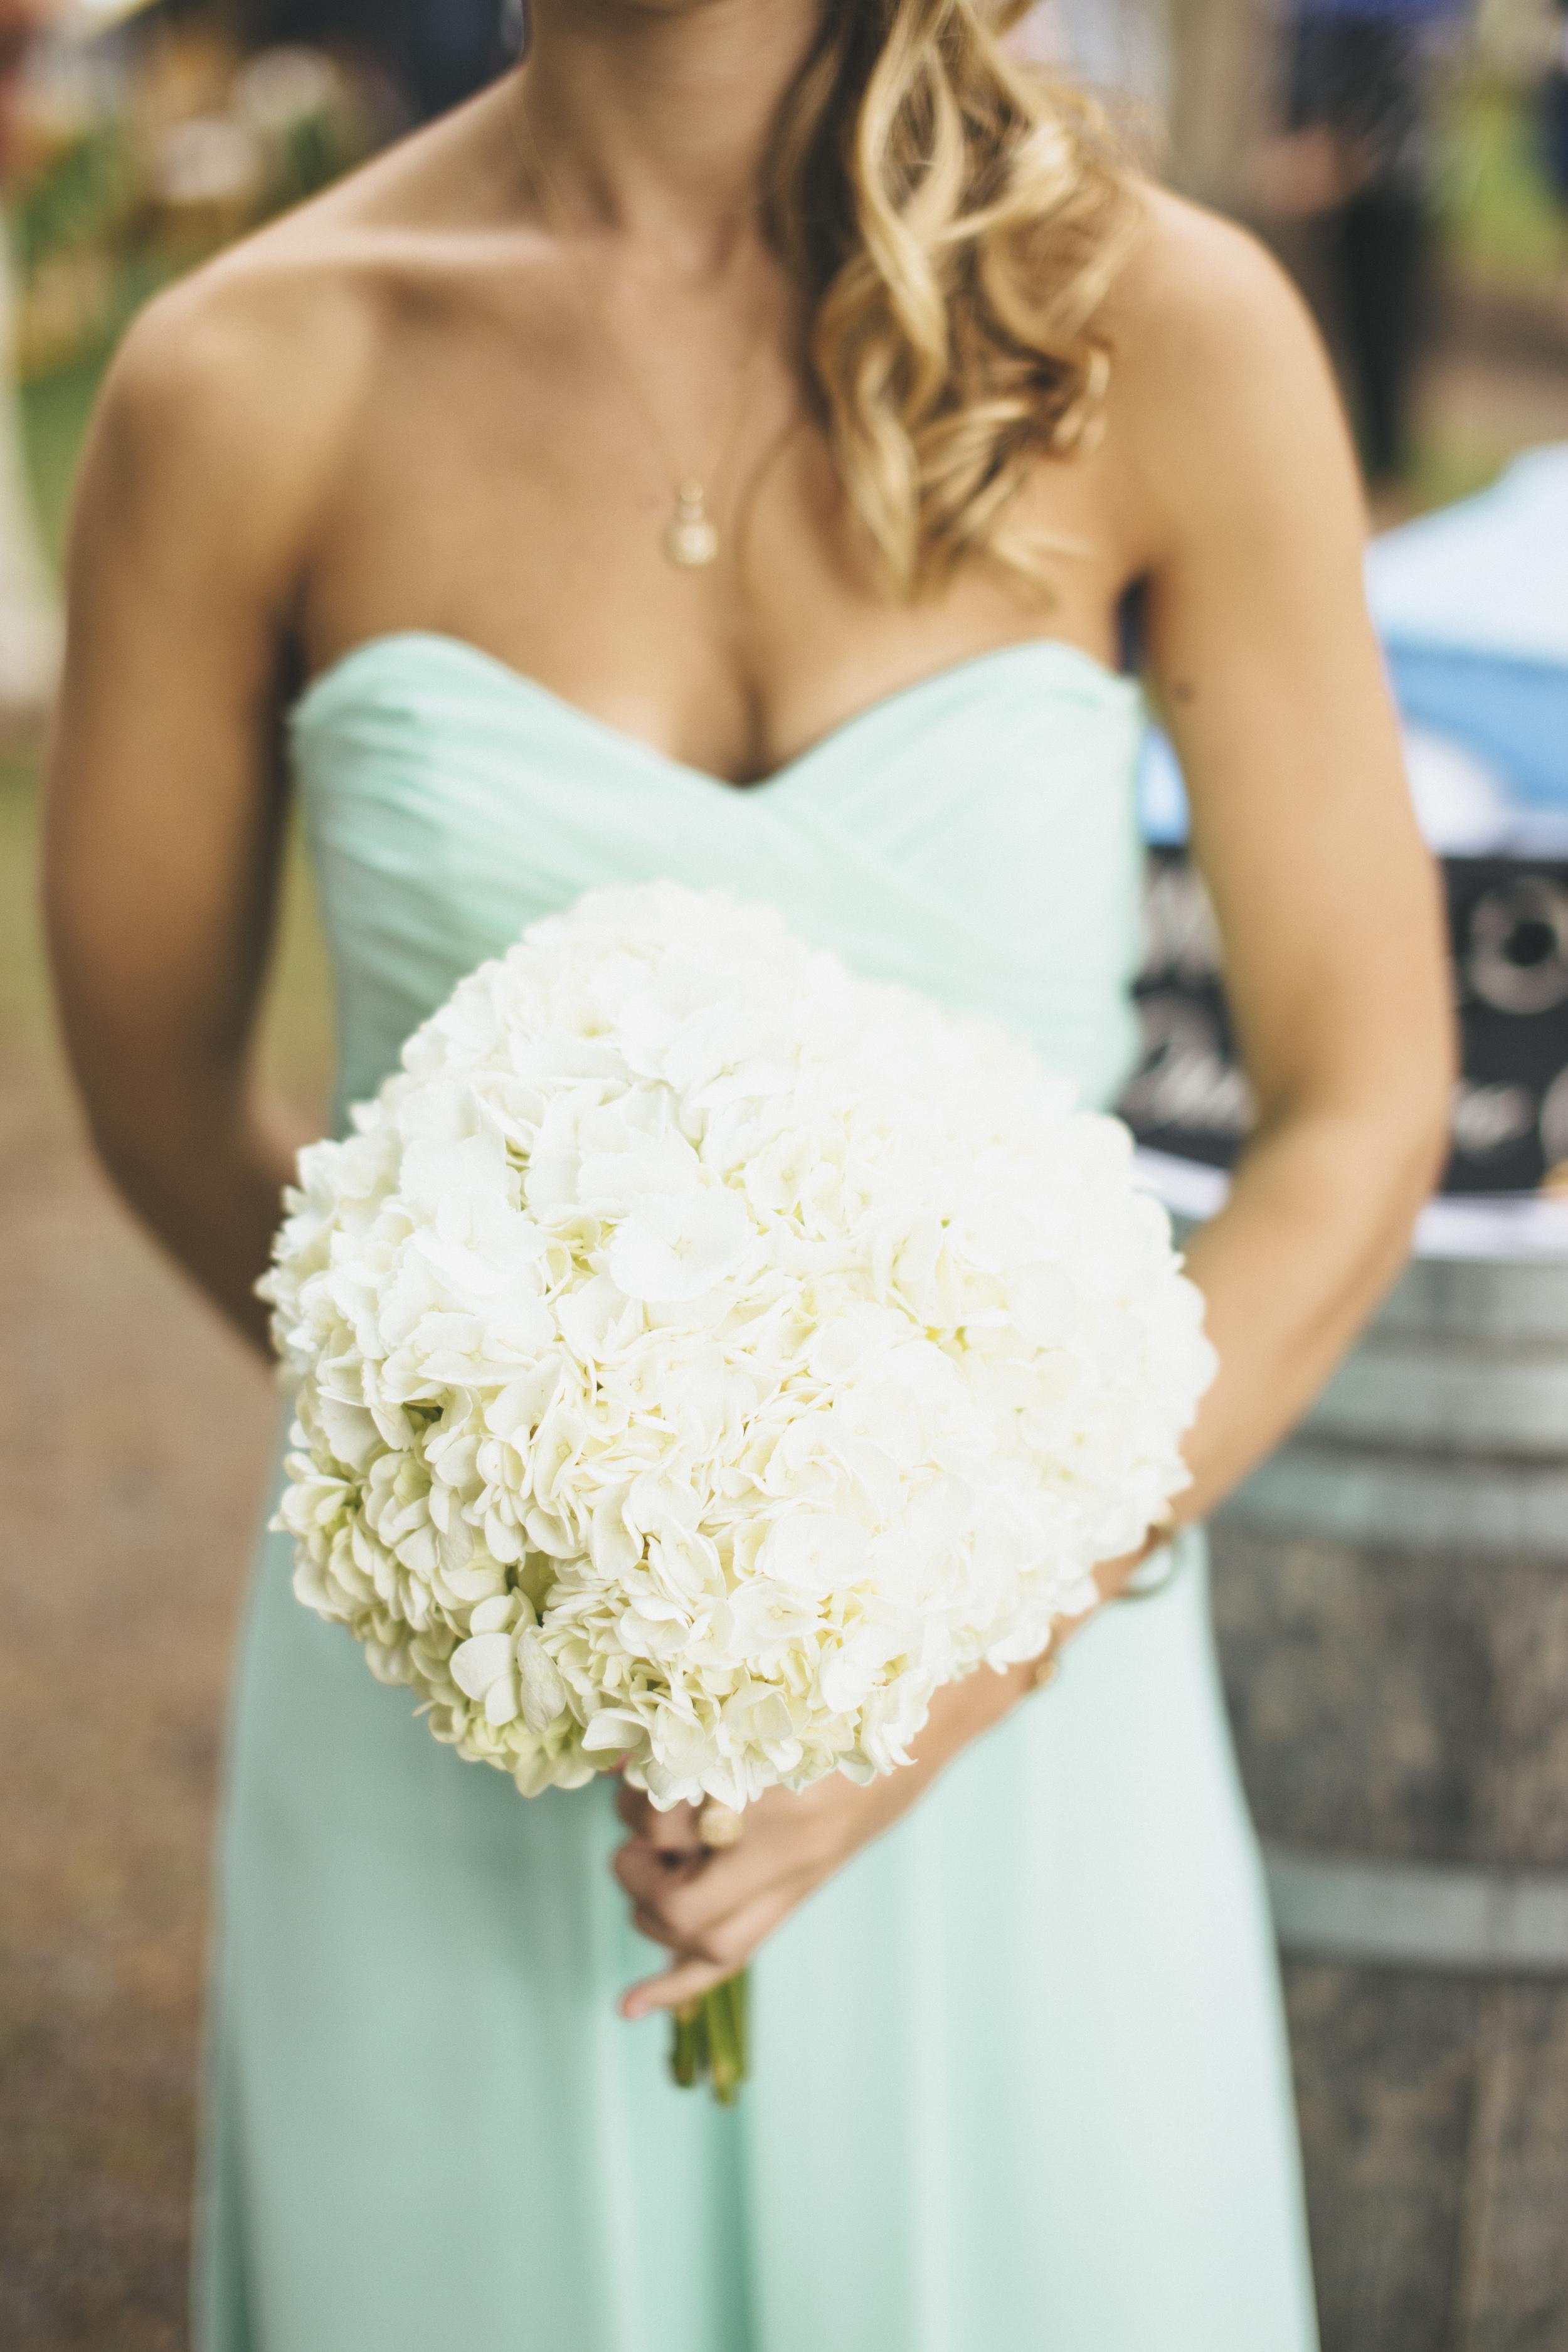 White Hydrangea Bridesmaid Bouquet